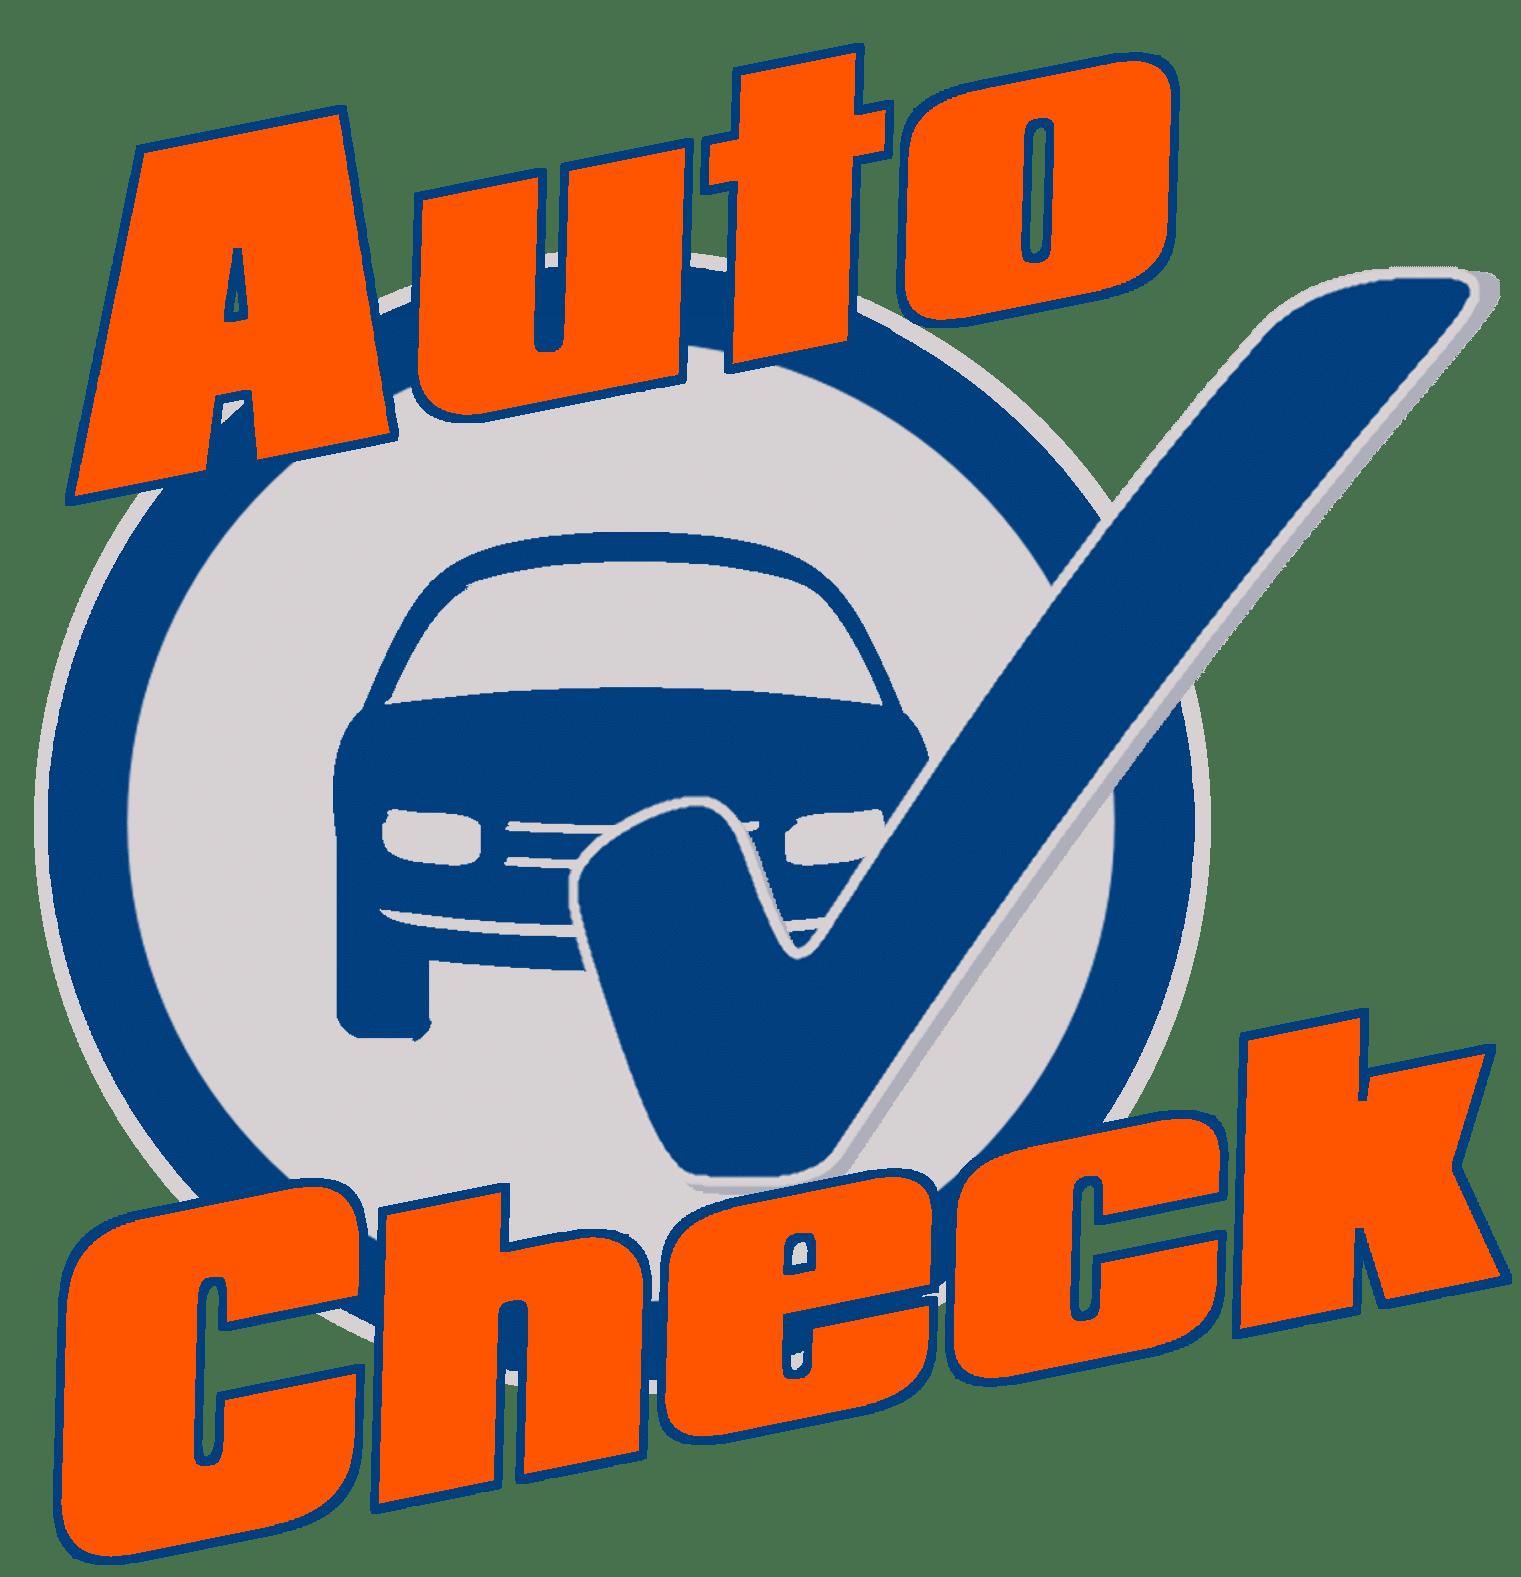 048d44d24c prosfores-service-synergeio-autocheck-fb - Γενικό συνεργείο αυτοκινήτων  AutoCheck